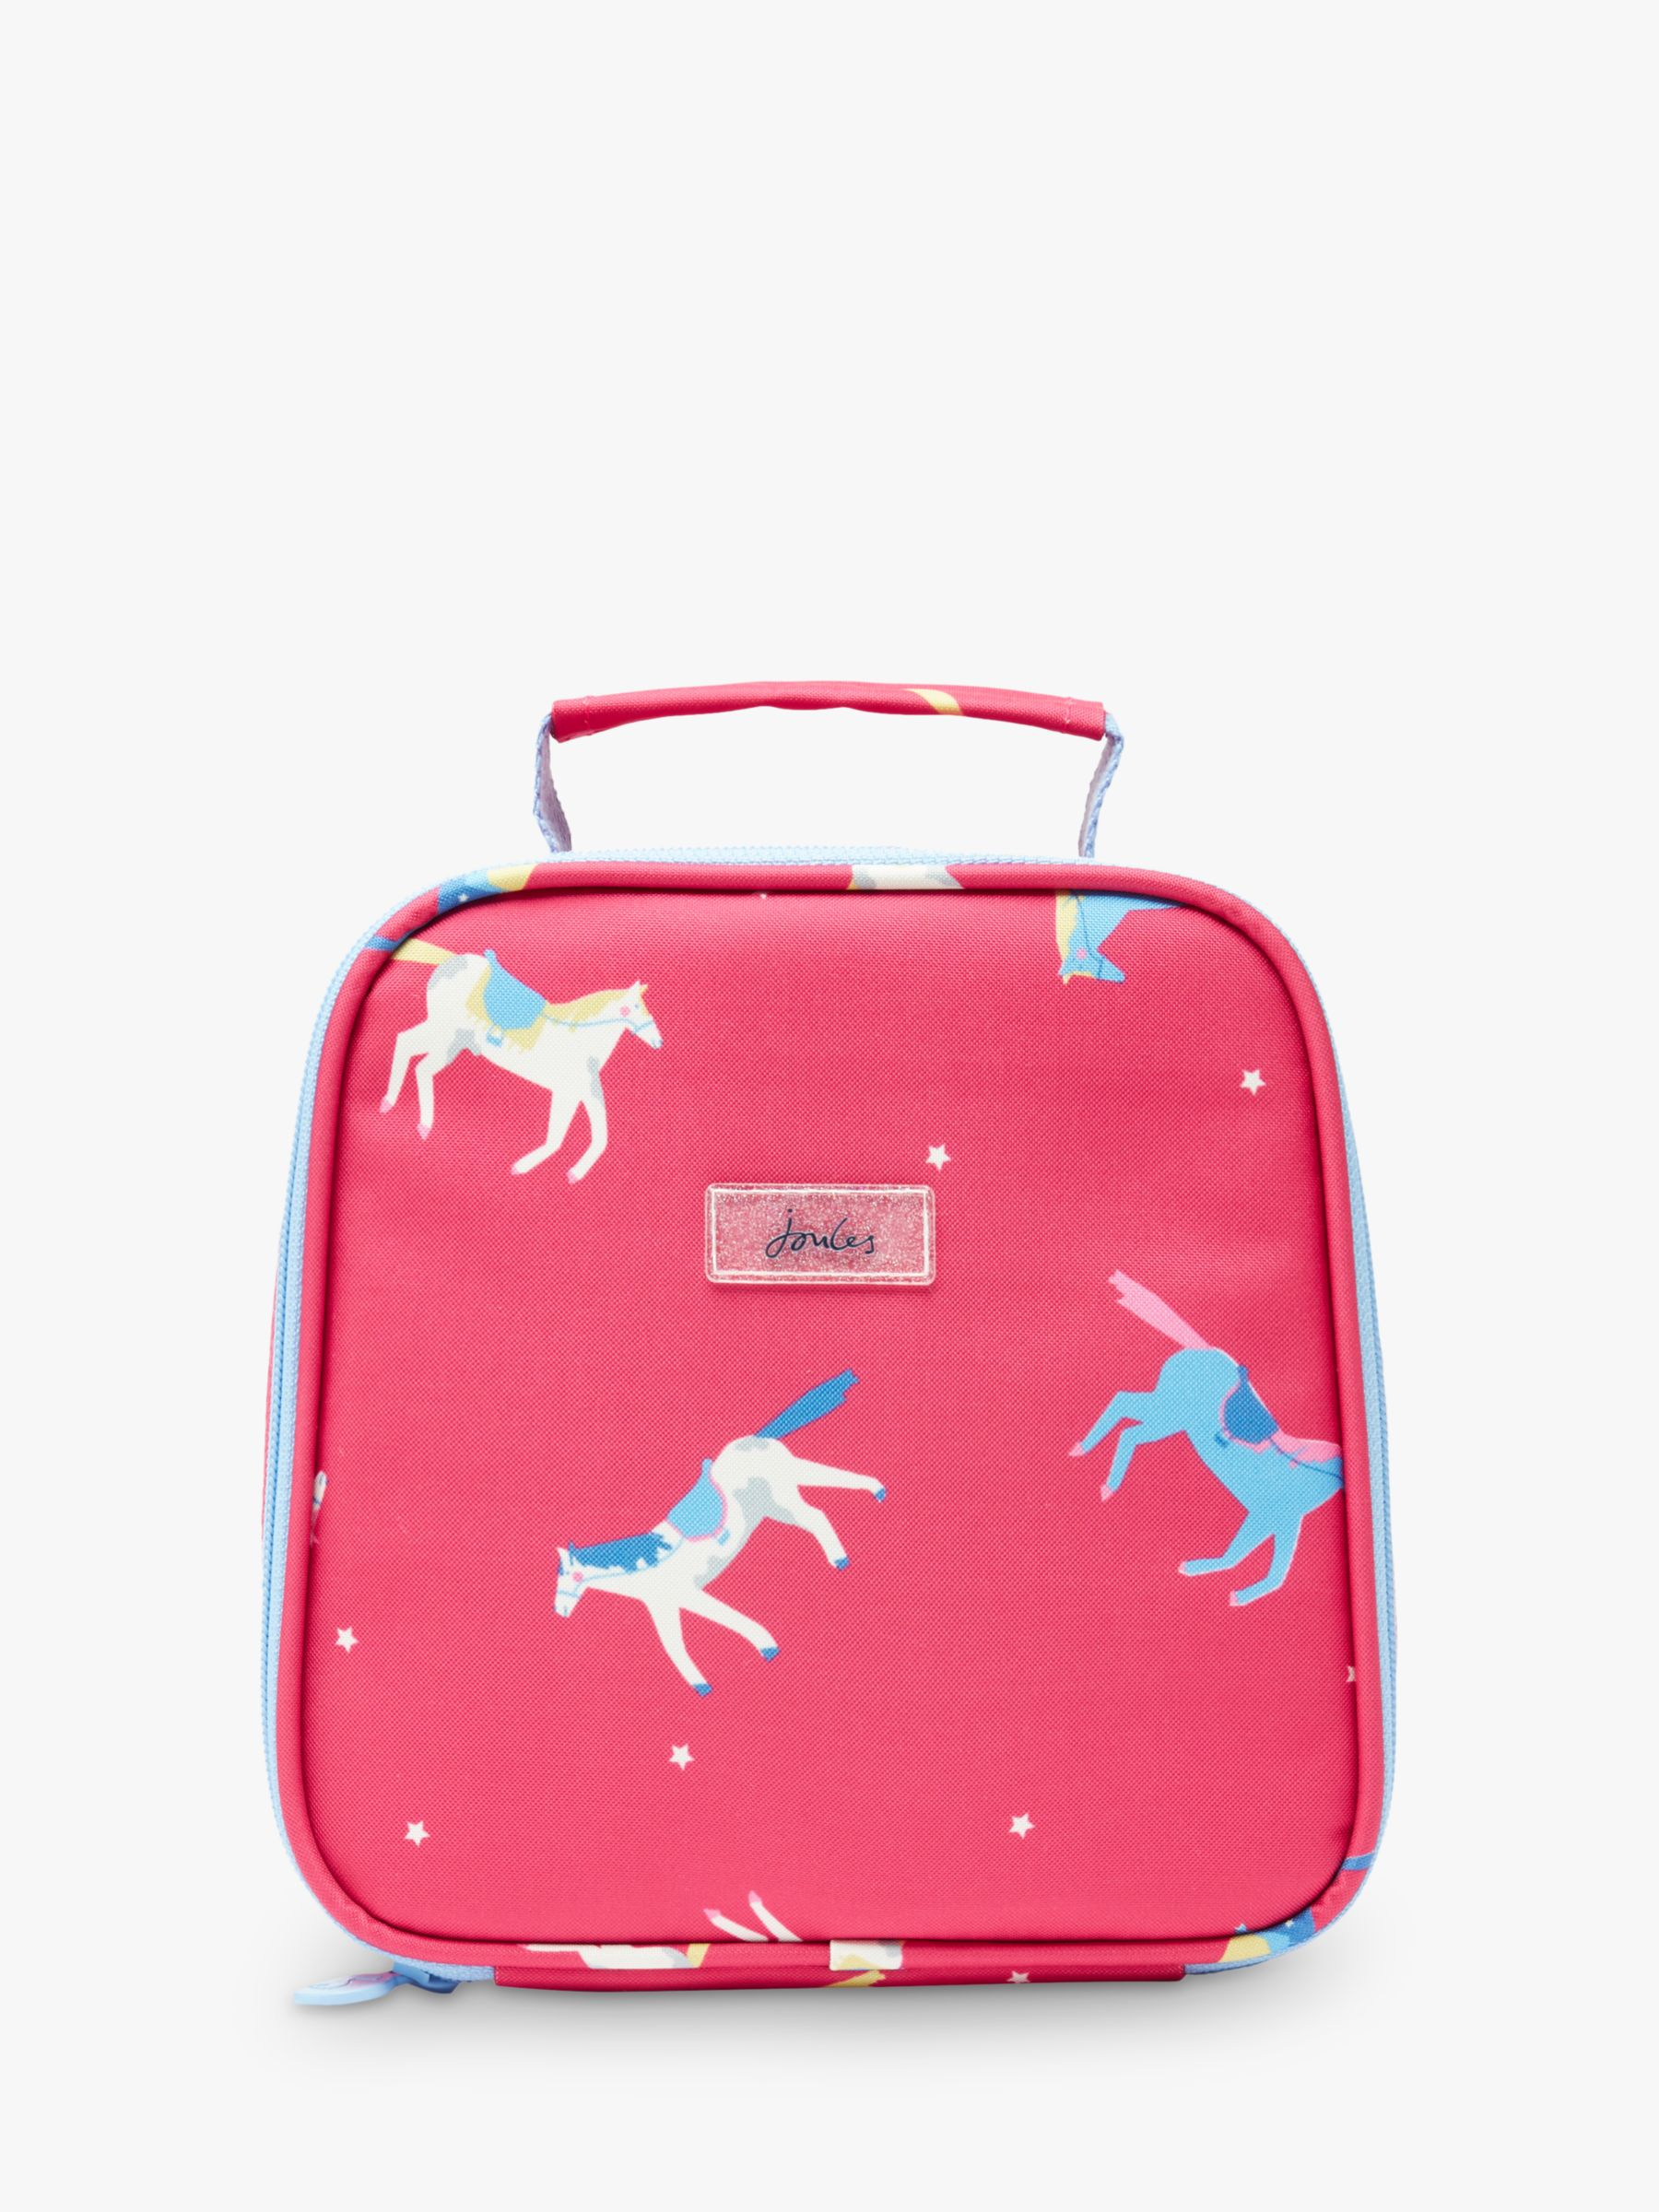 Joules Little Joule Children's Horse Print Lunch Bag, Pink